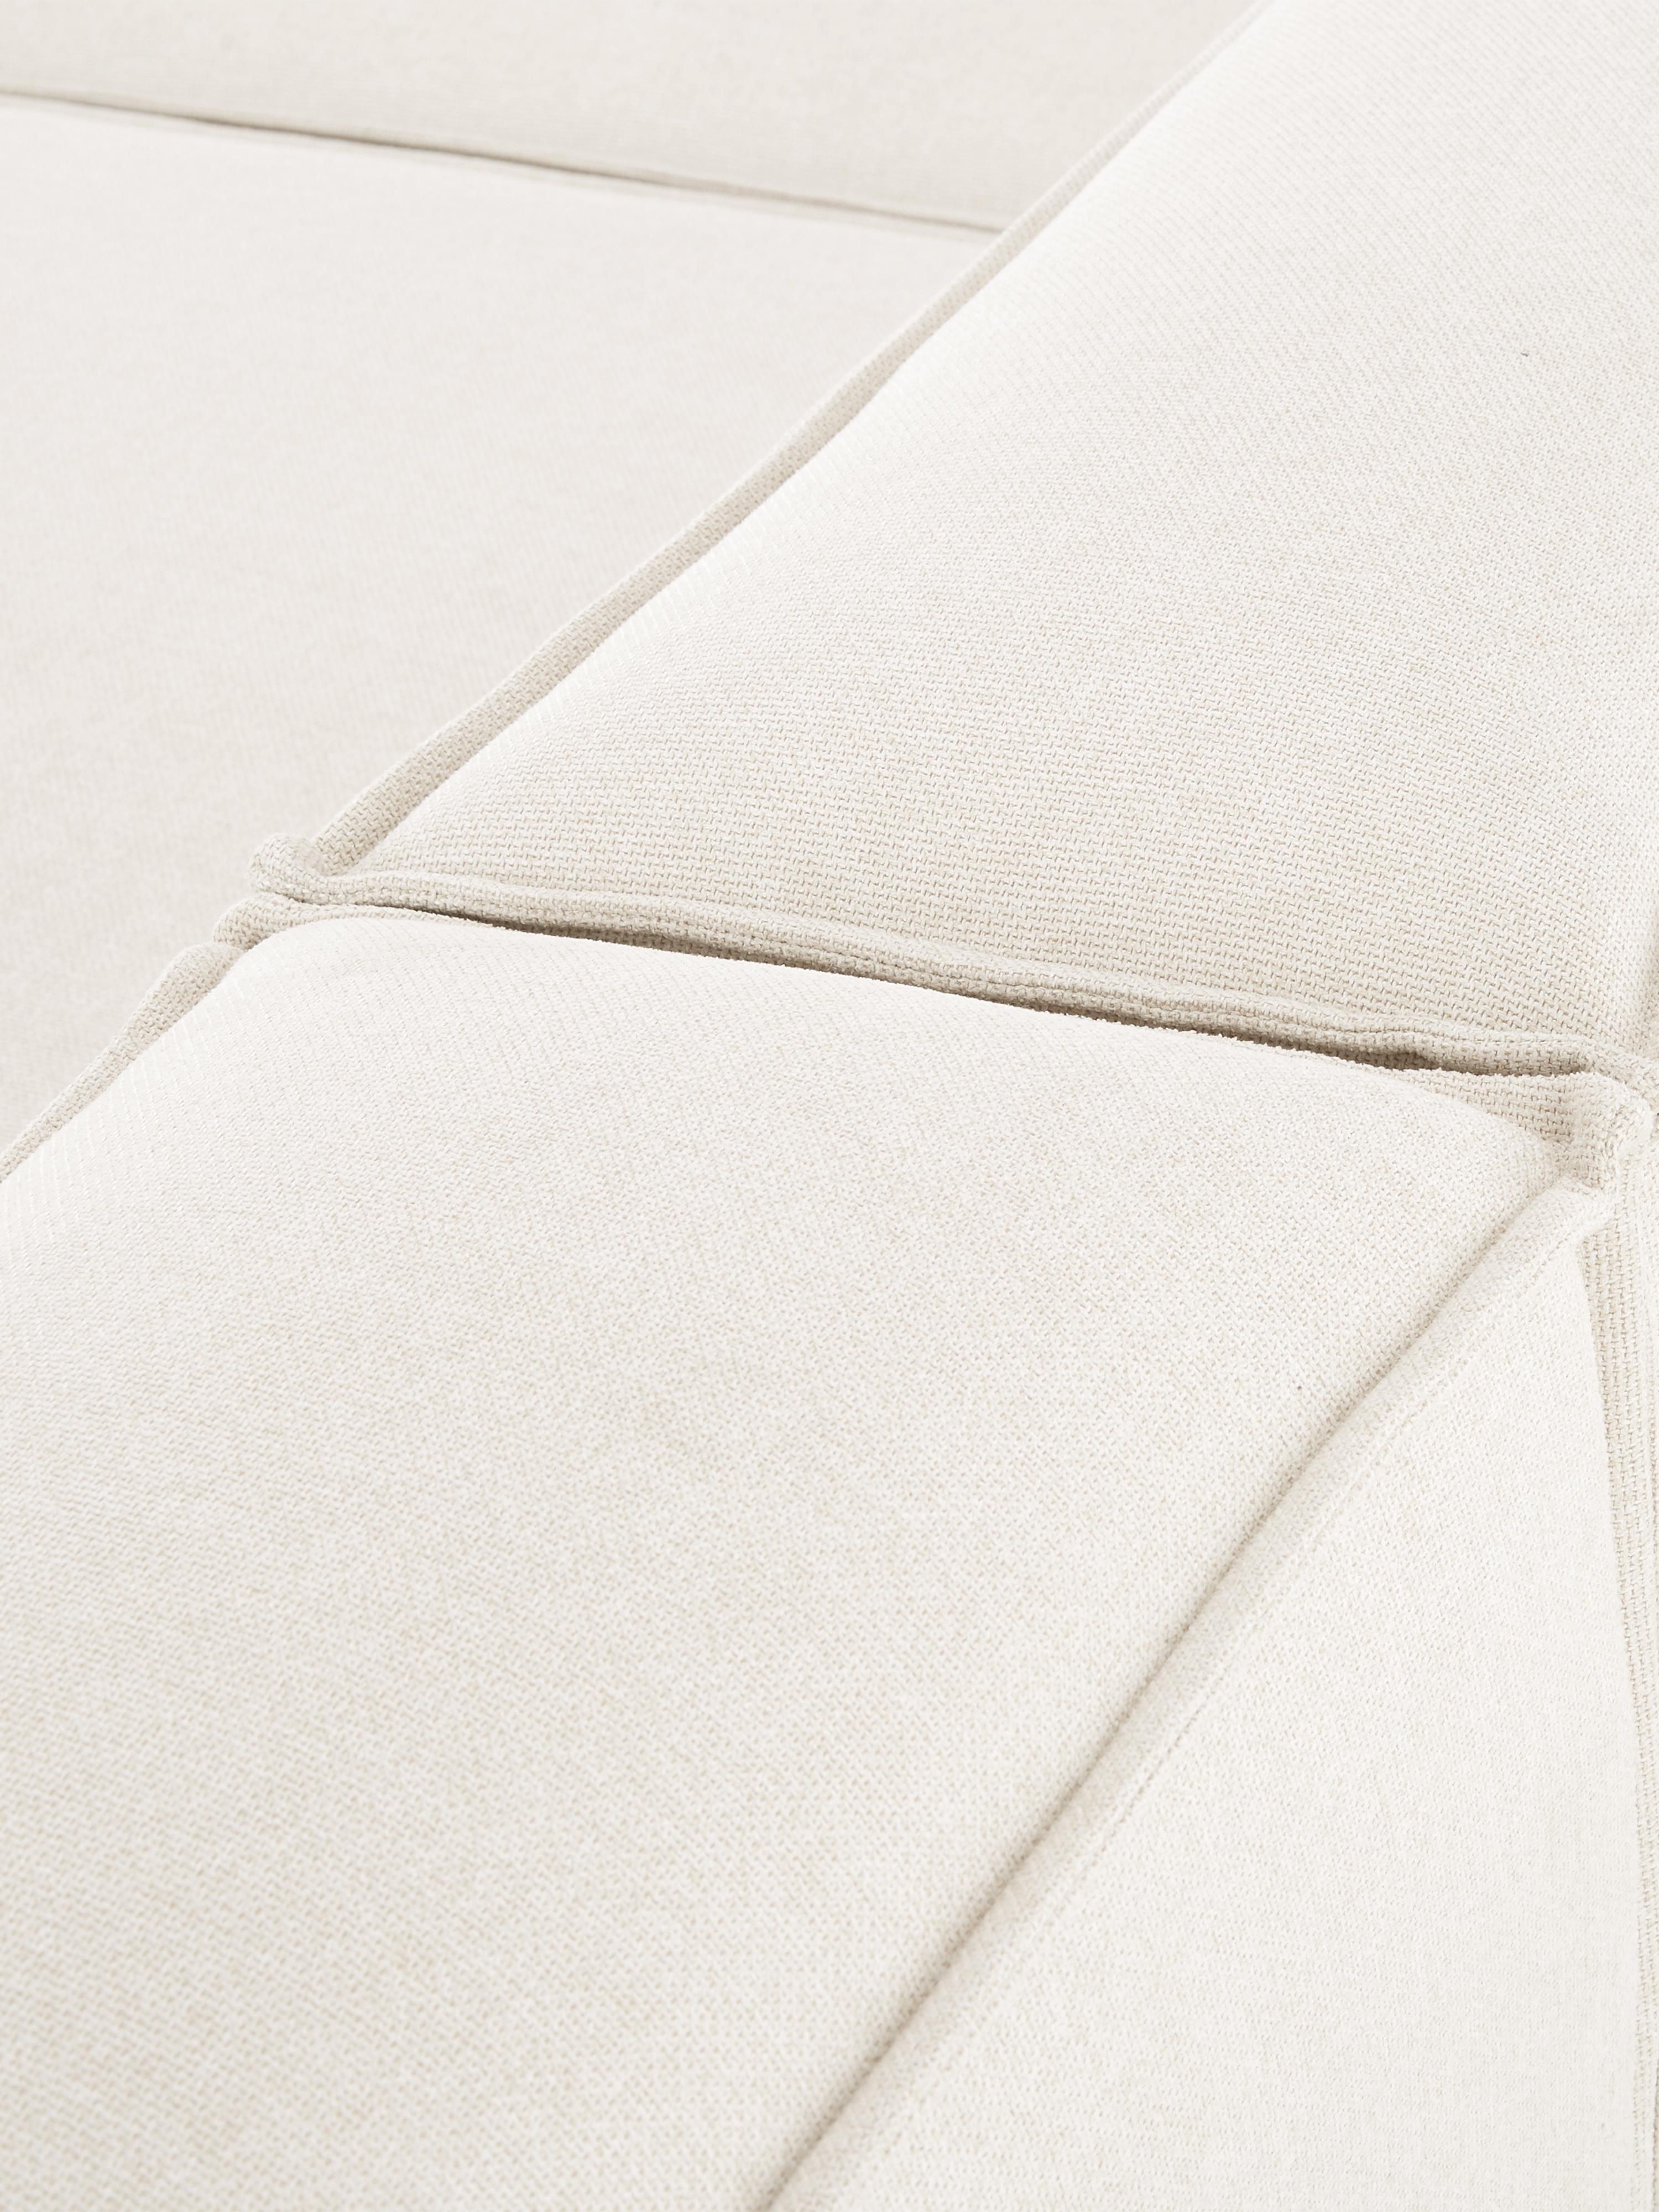 Sofá modular Lennon (4plazas), Tapizado: poliéster Alta resistenci, Estructura: madera de pino maciza, ma, Patas: plástico, Tejido beige, An 326 x F 119 cm